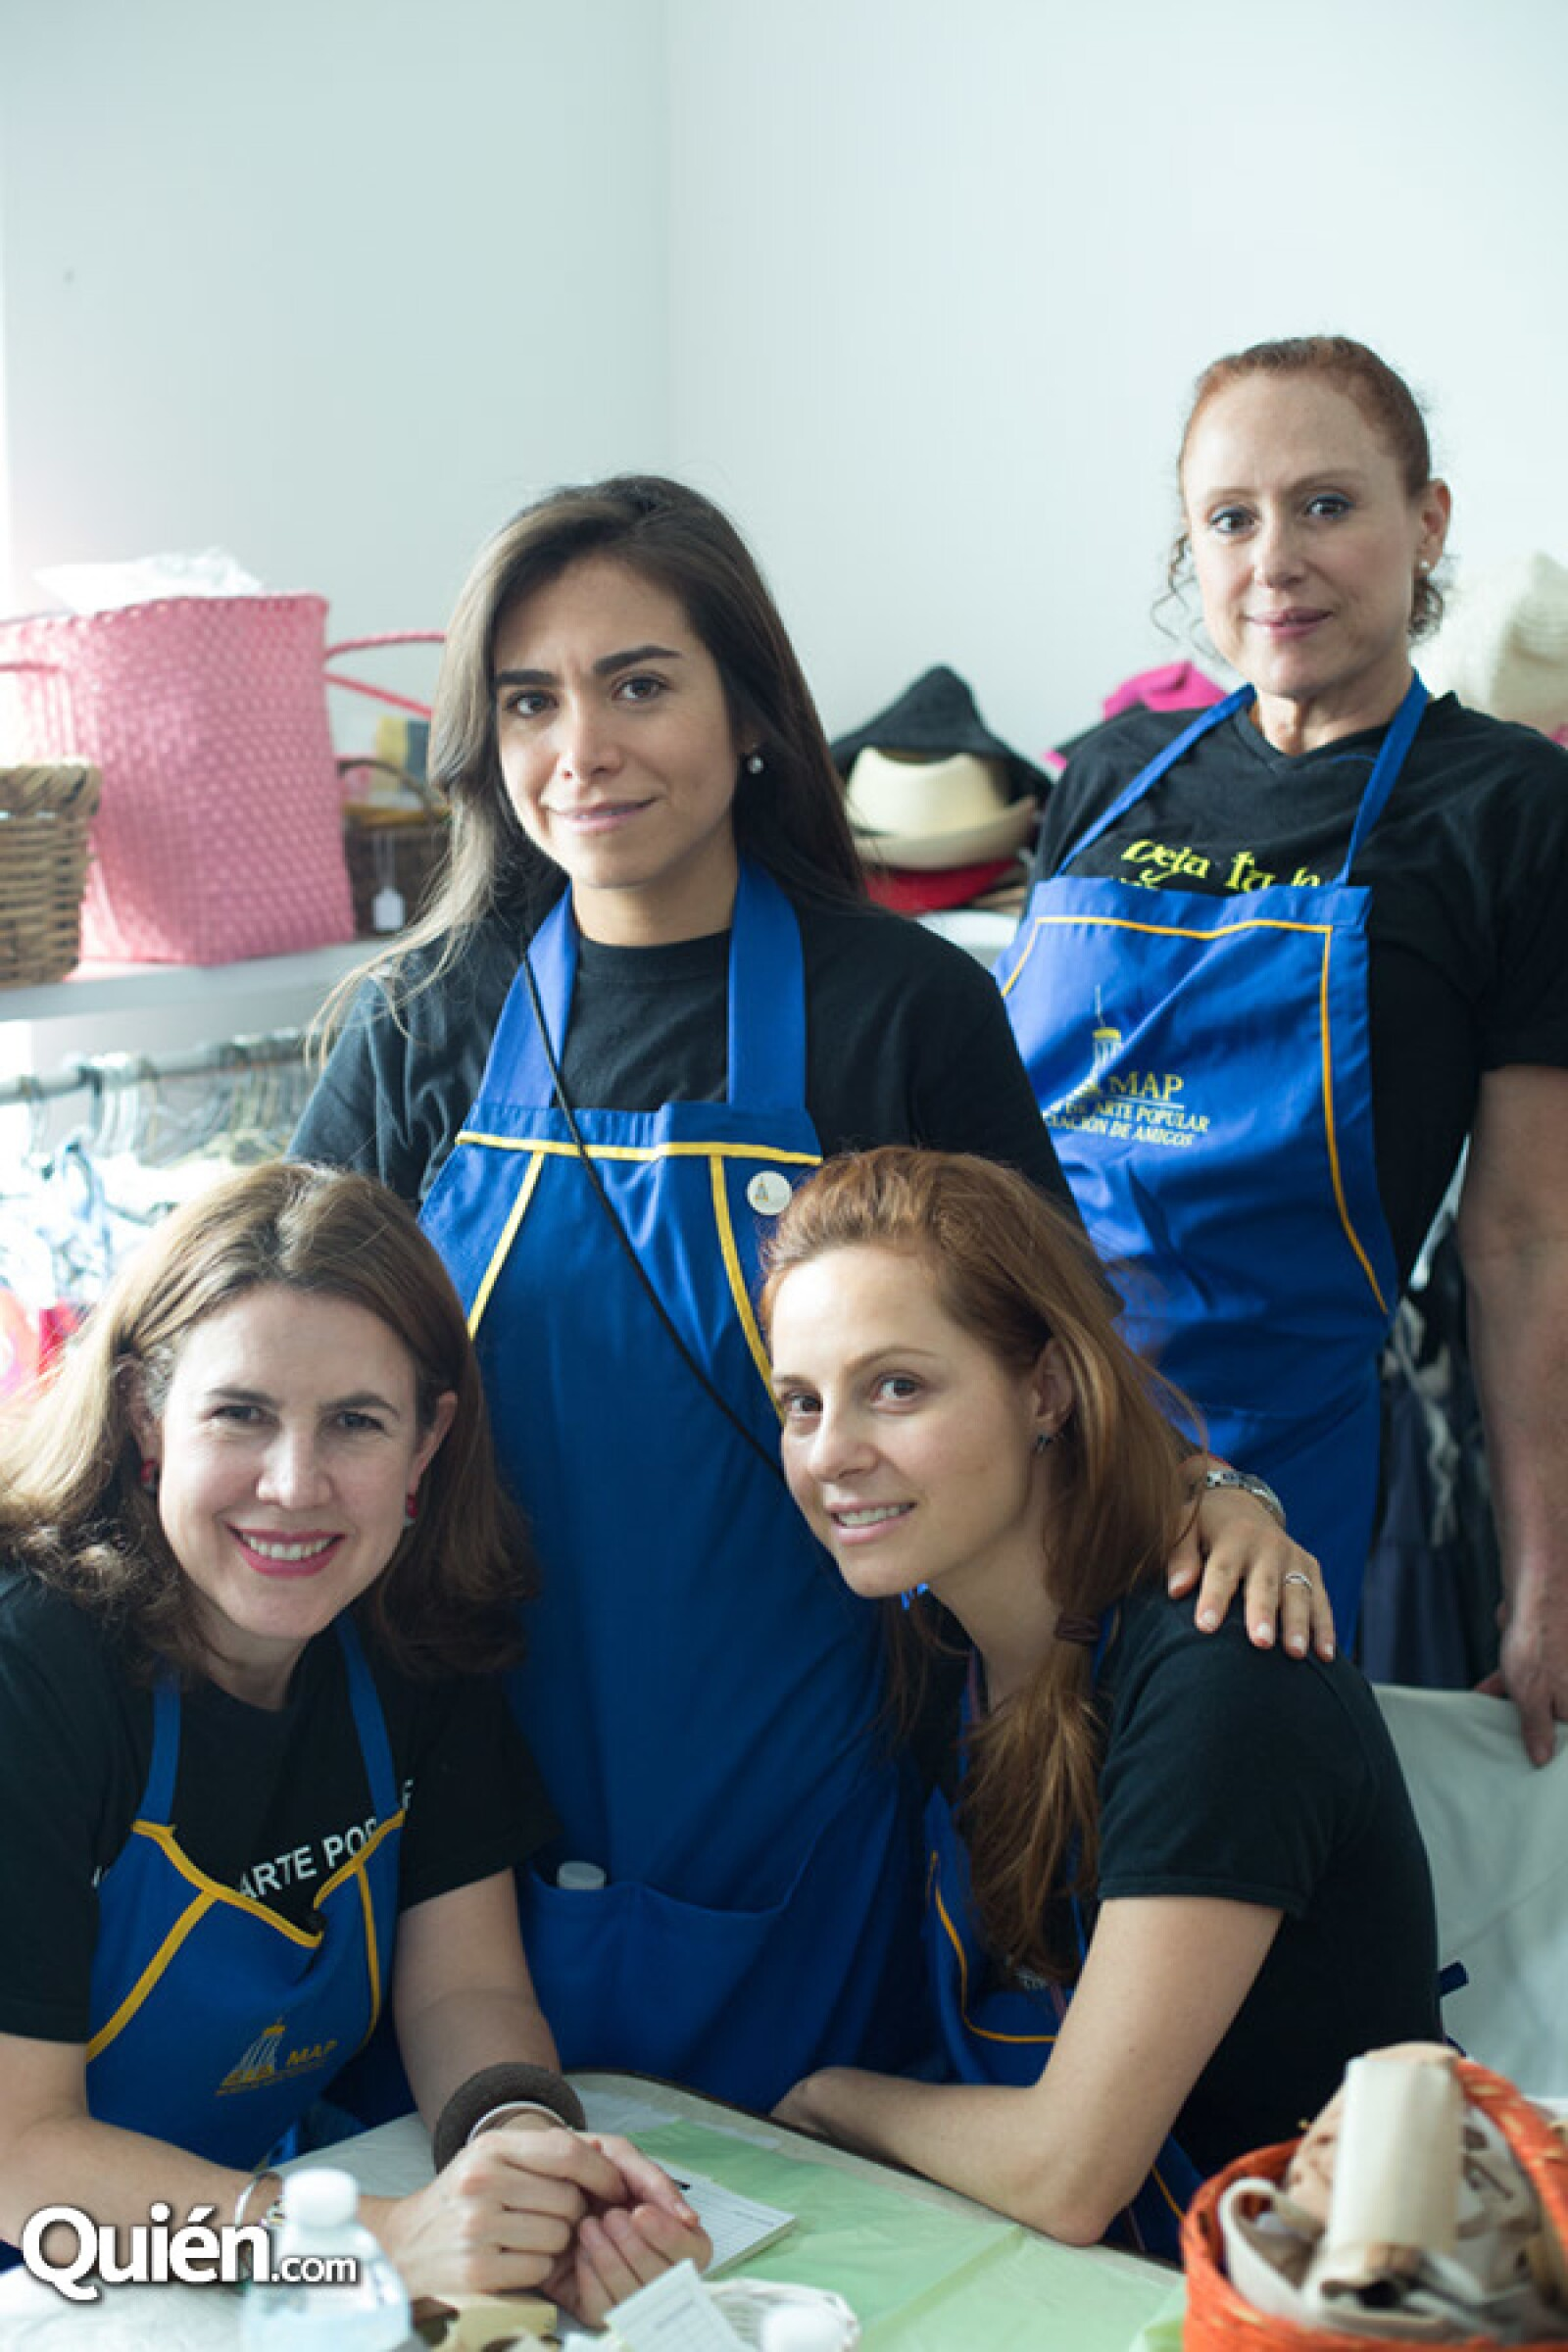 Mónica Vargas, Anna Irene Nava, Fernanda Abundis y Mely Lichtinger